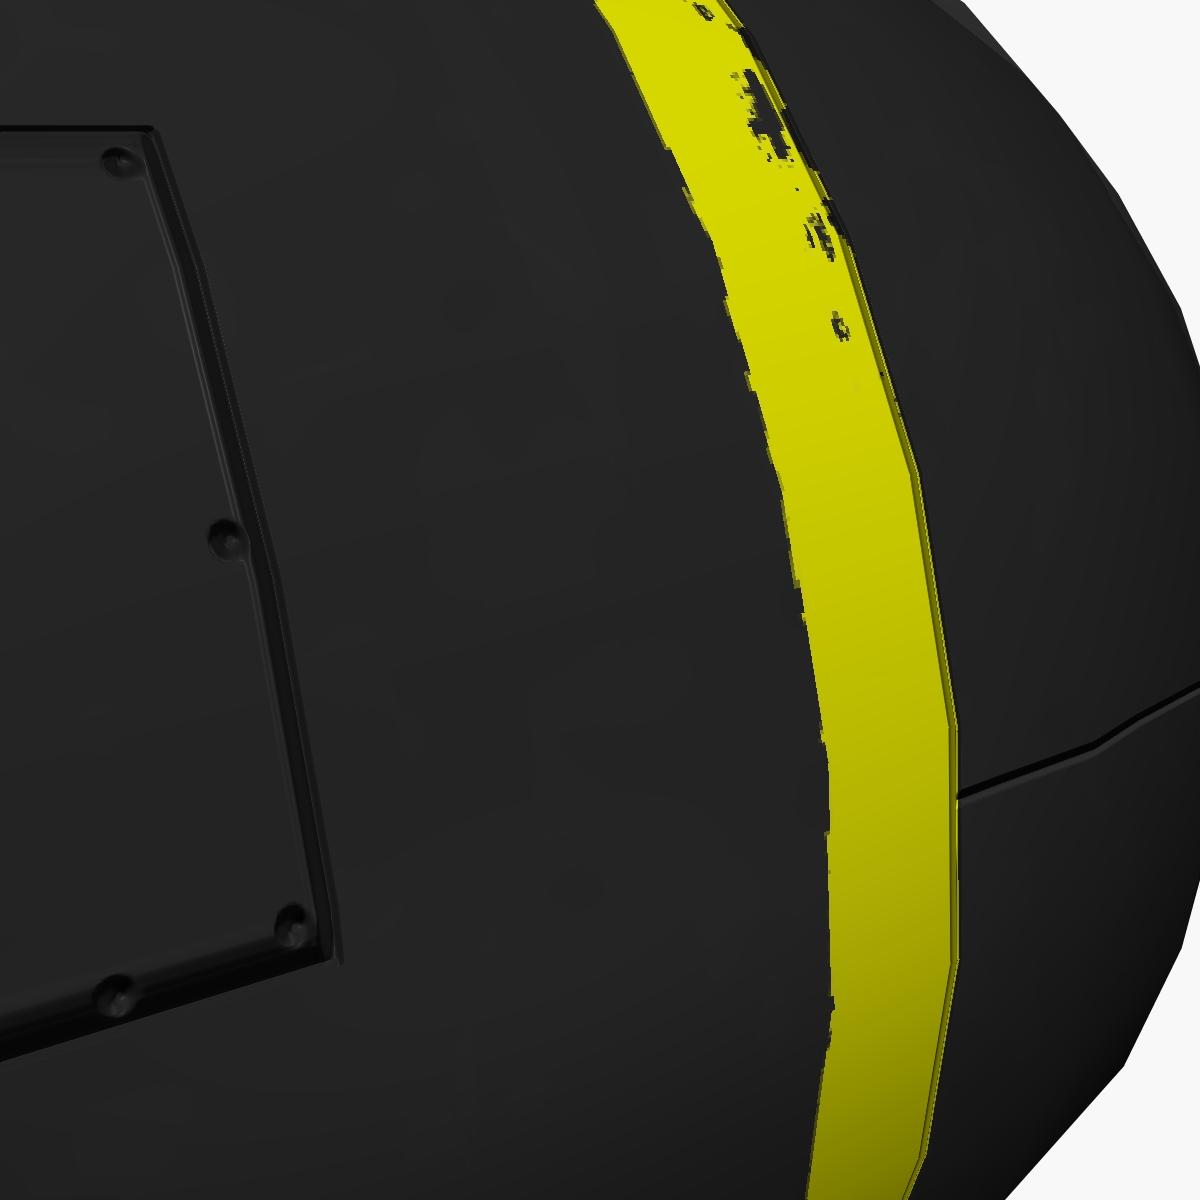 Bomb, Jolly Roger scheme 3d model 3ds dxf fbx blend cob dae X obj 162671